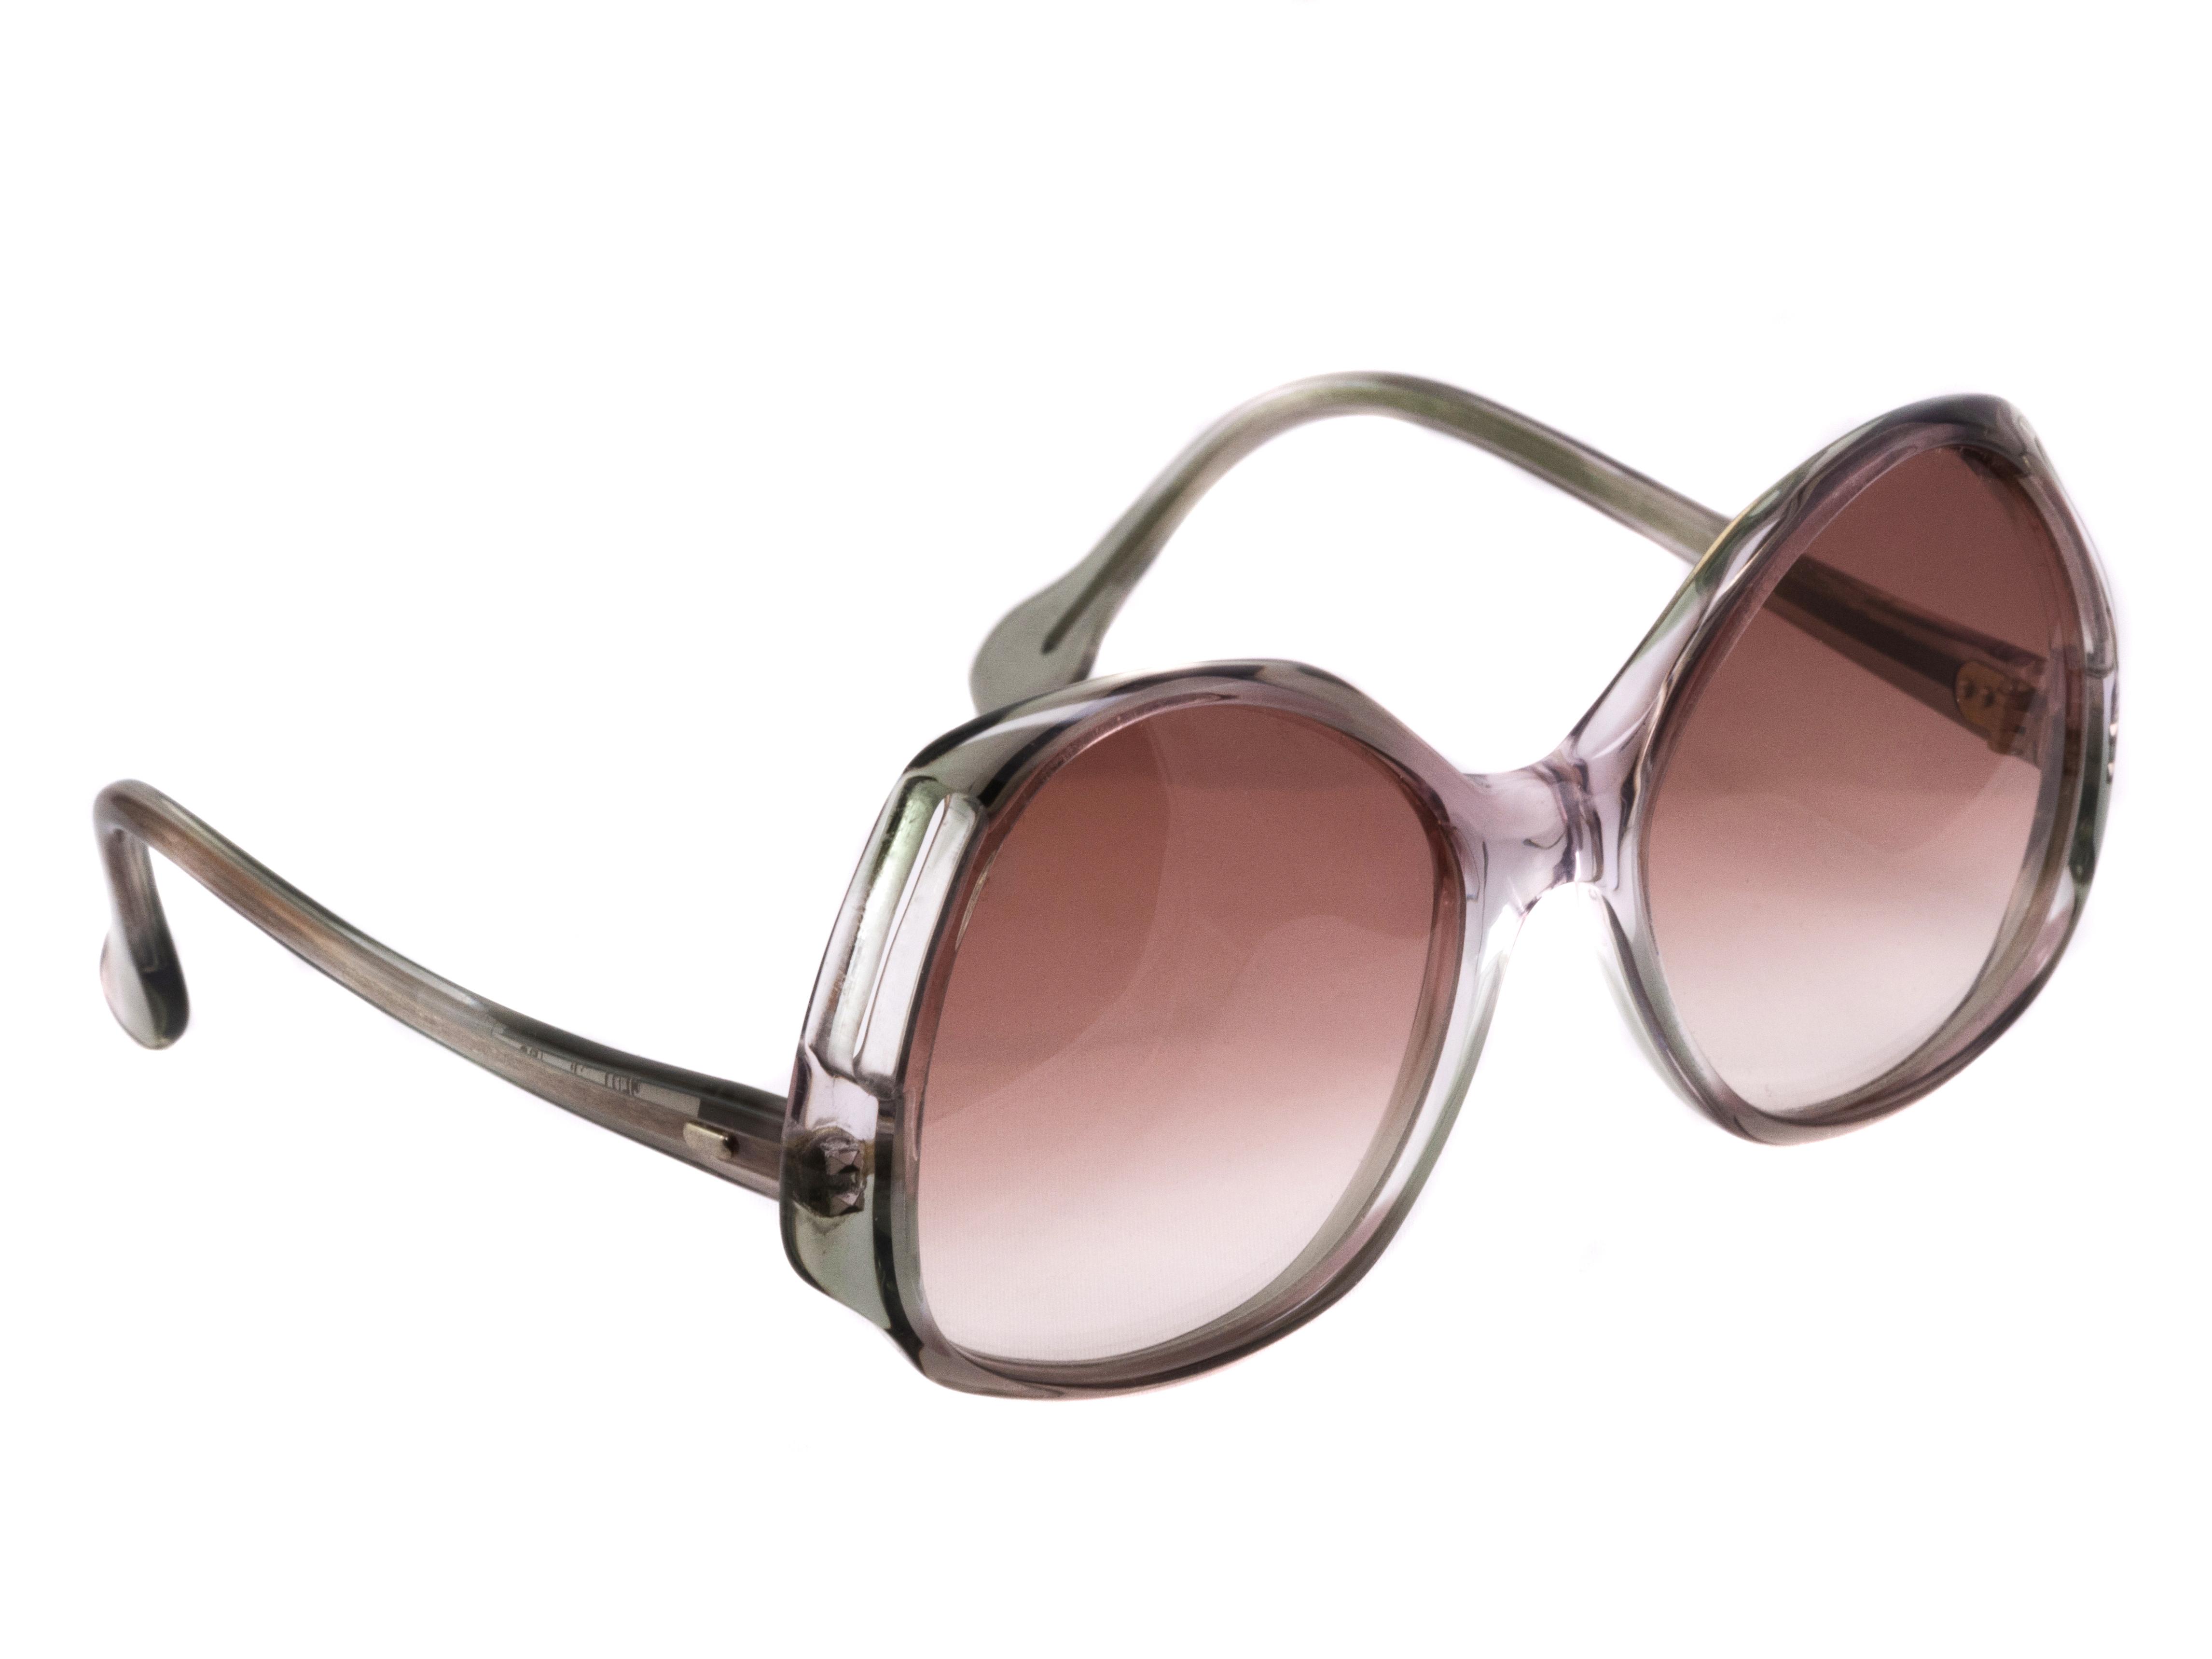 vintage sunglasses, oversized sunglasses, big vintage sunglasses, oversized vintage sunglasses, jackie o sunglasses